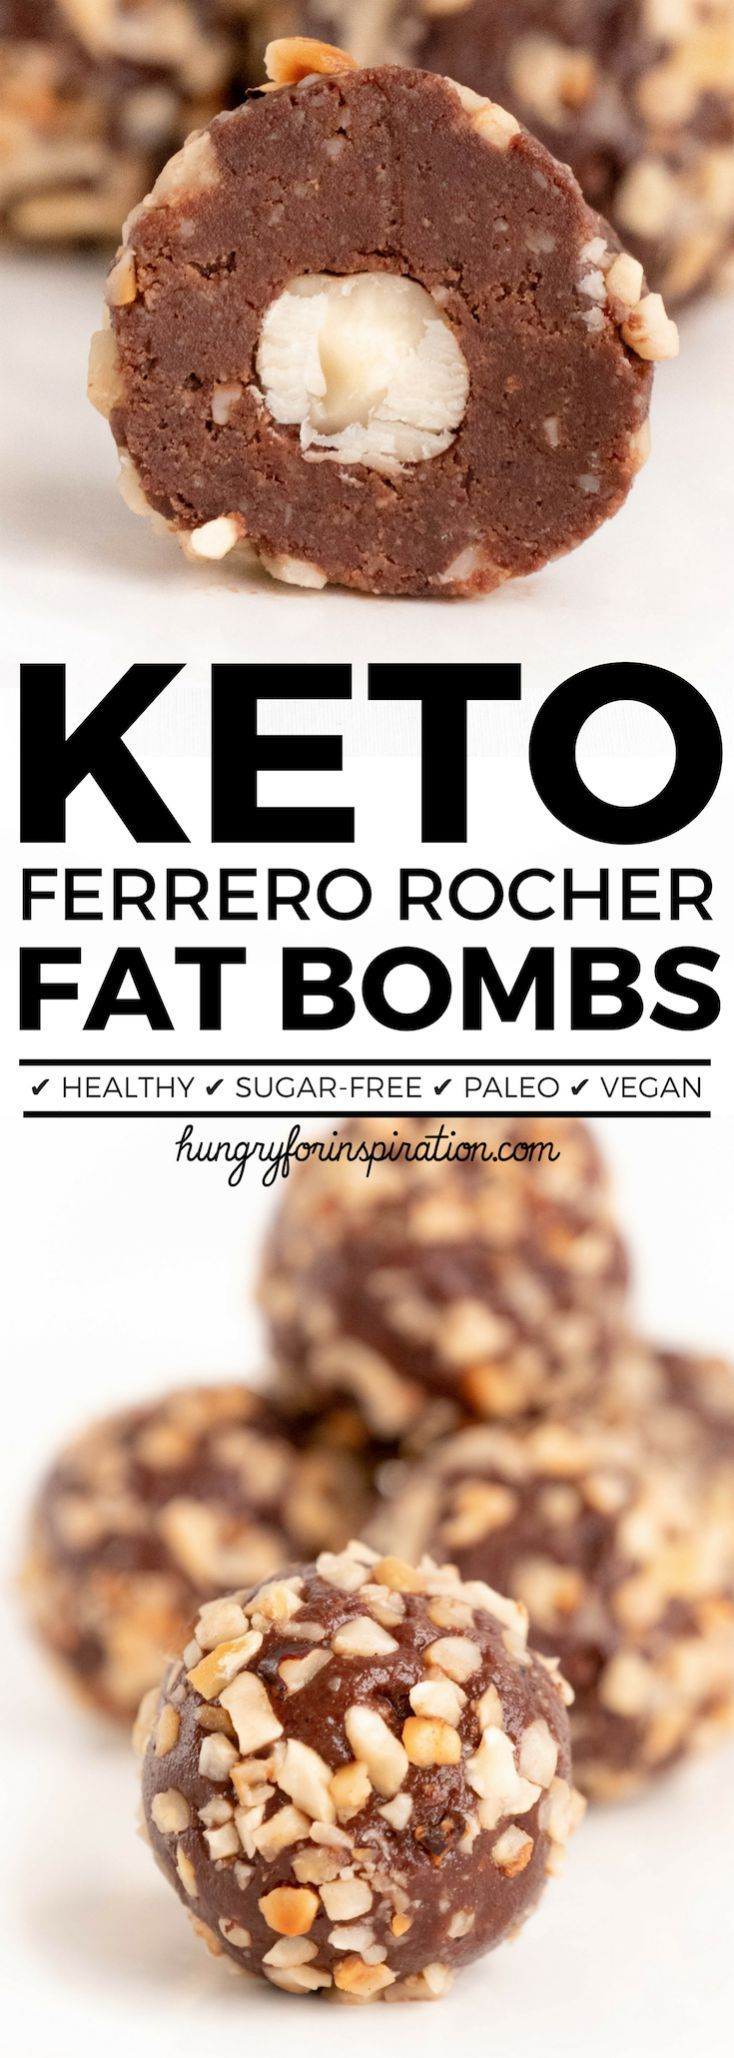 7 Easy Keto Dessert Recipes: No Bake Ketogenic Diet Desserts